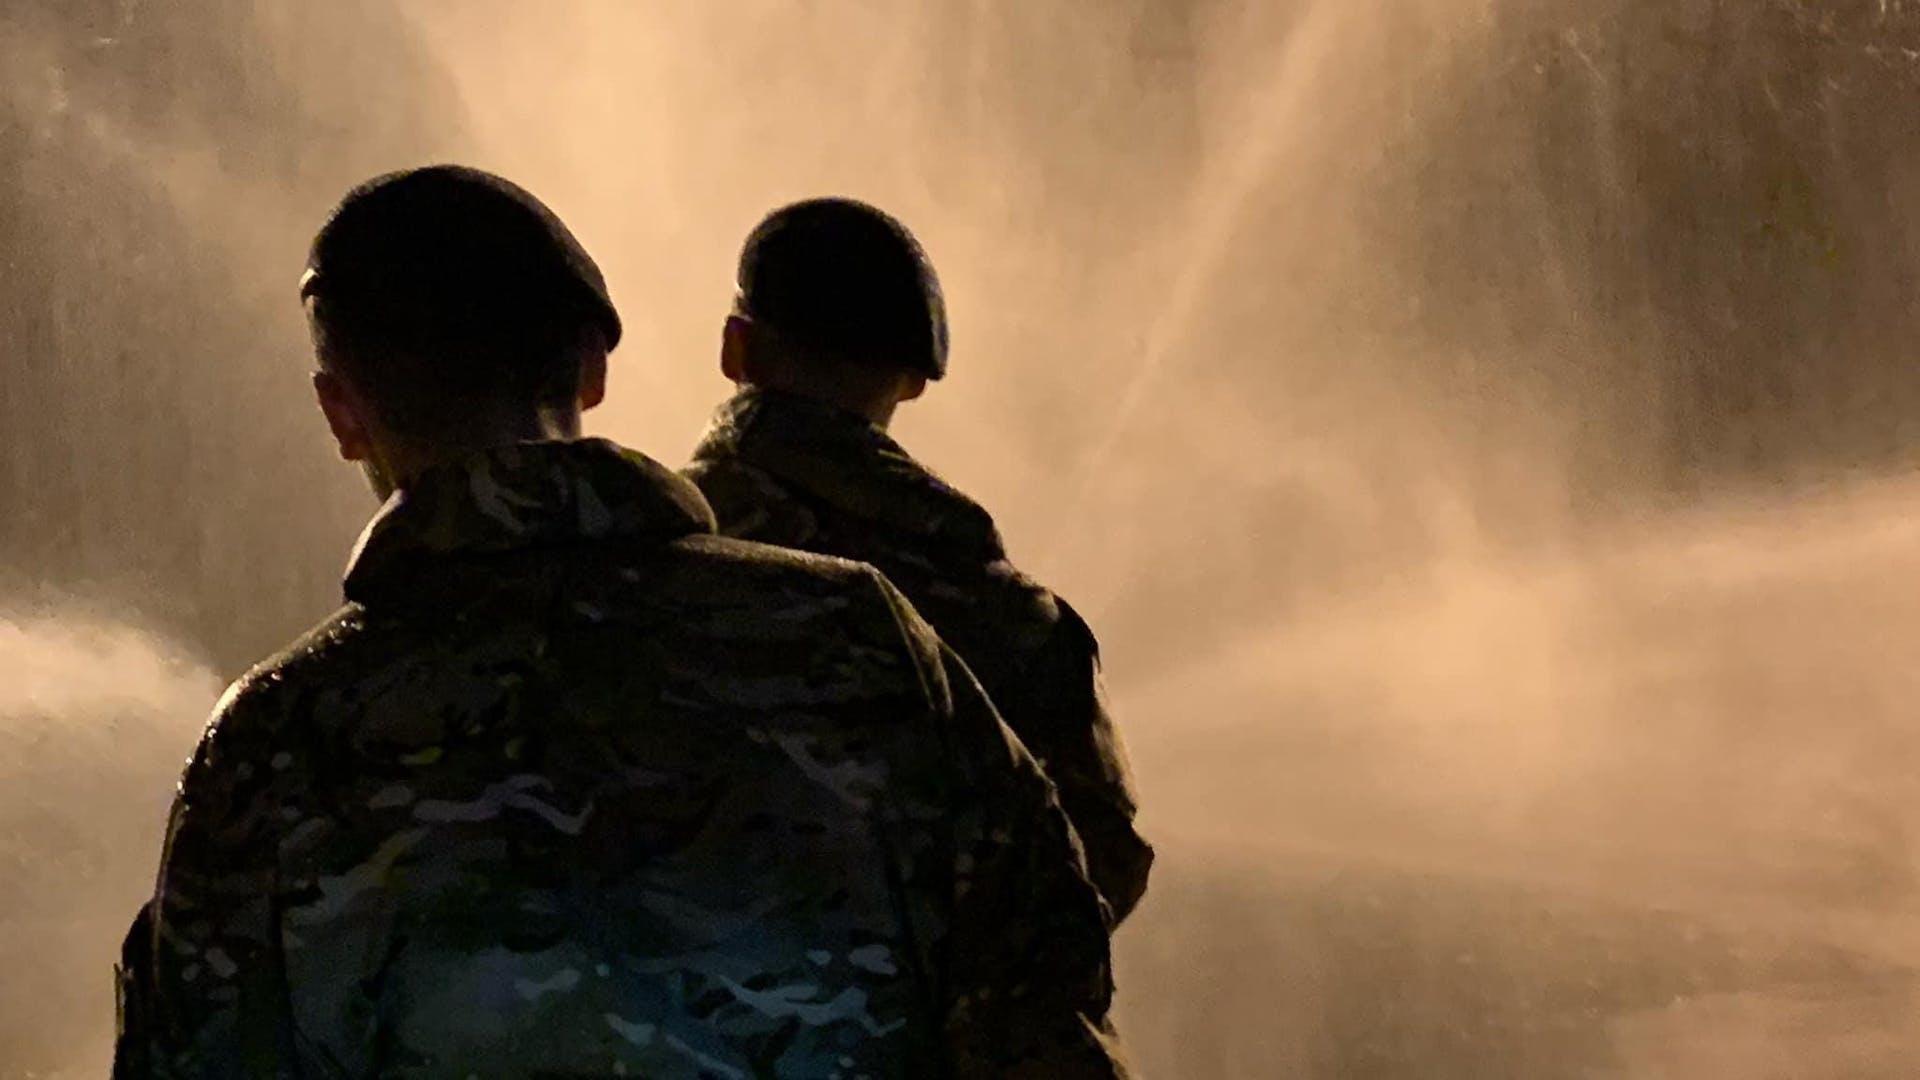 ARMY CADET VOLUNTEER IN CHARITY CALENDAR SUCCESS